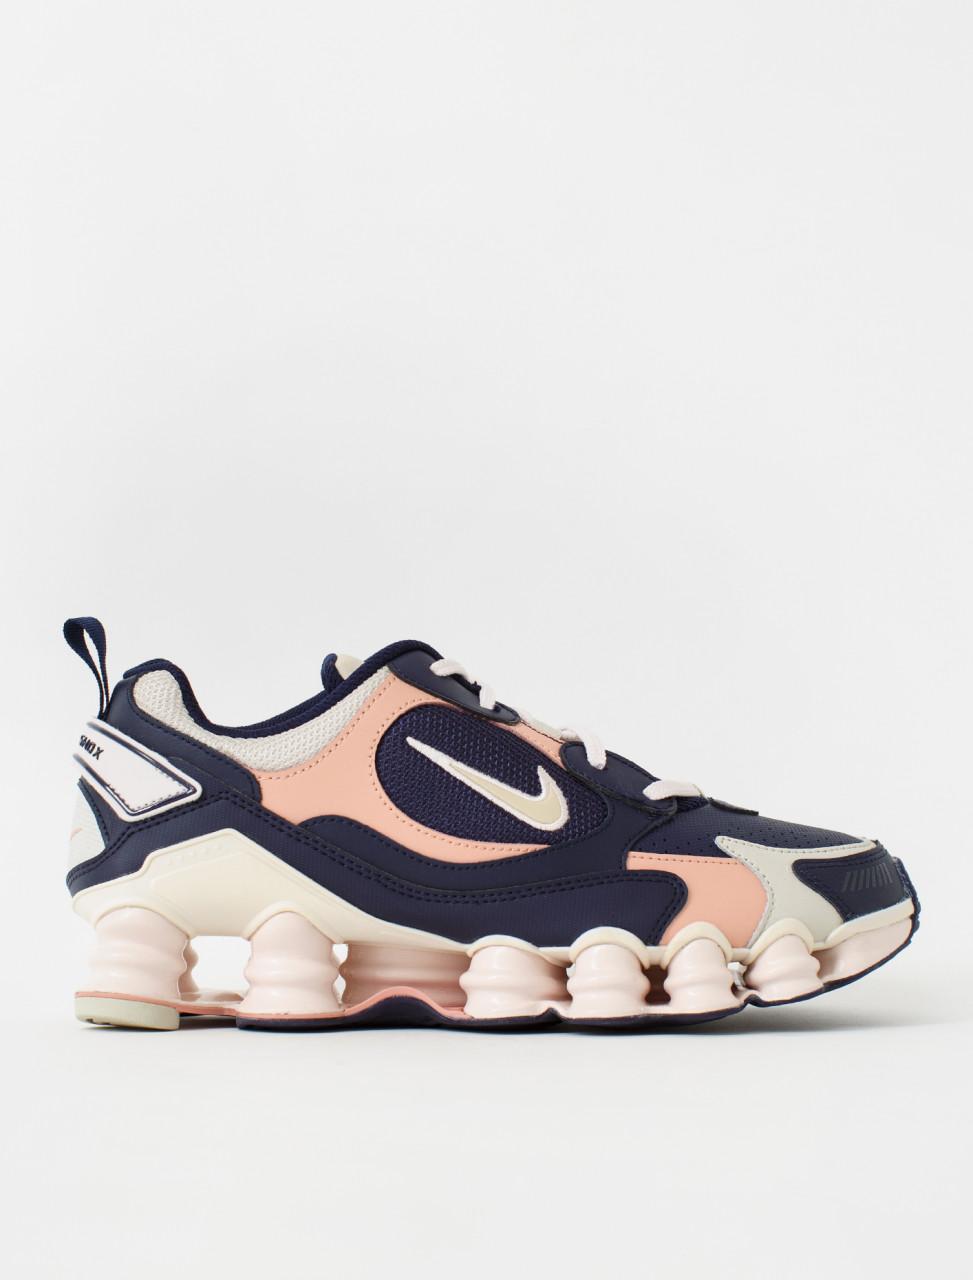 Shox TL Nova Sneaker